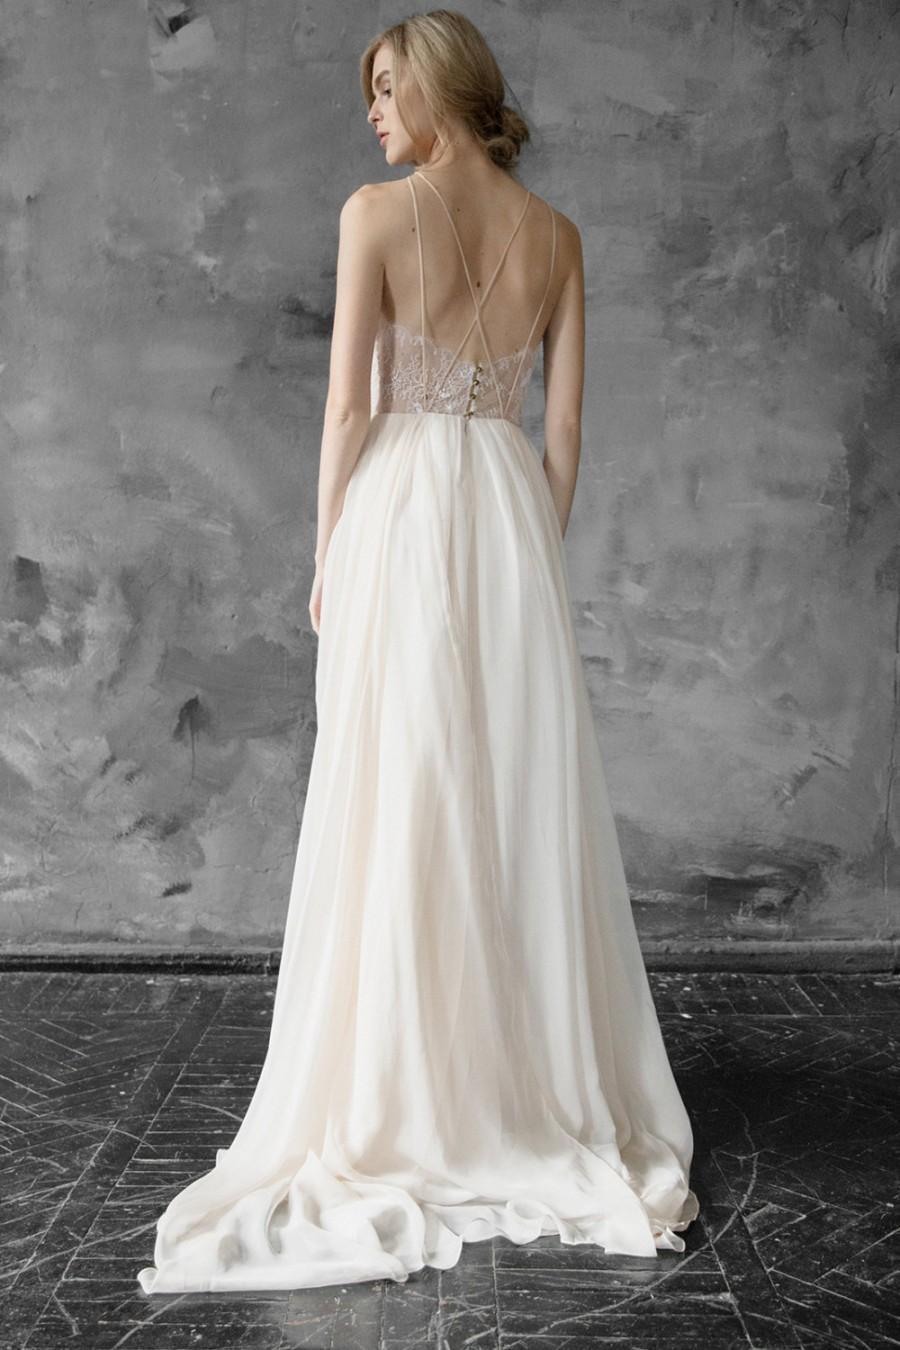 Mariage - Melita // Lace and chiffon halter-neck wedding dress